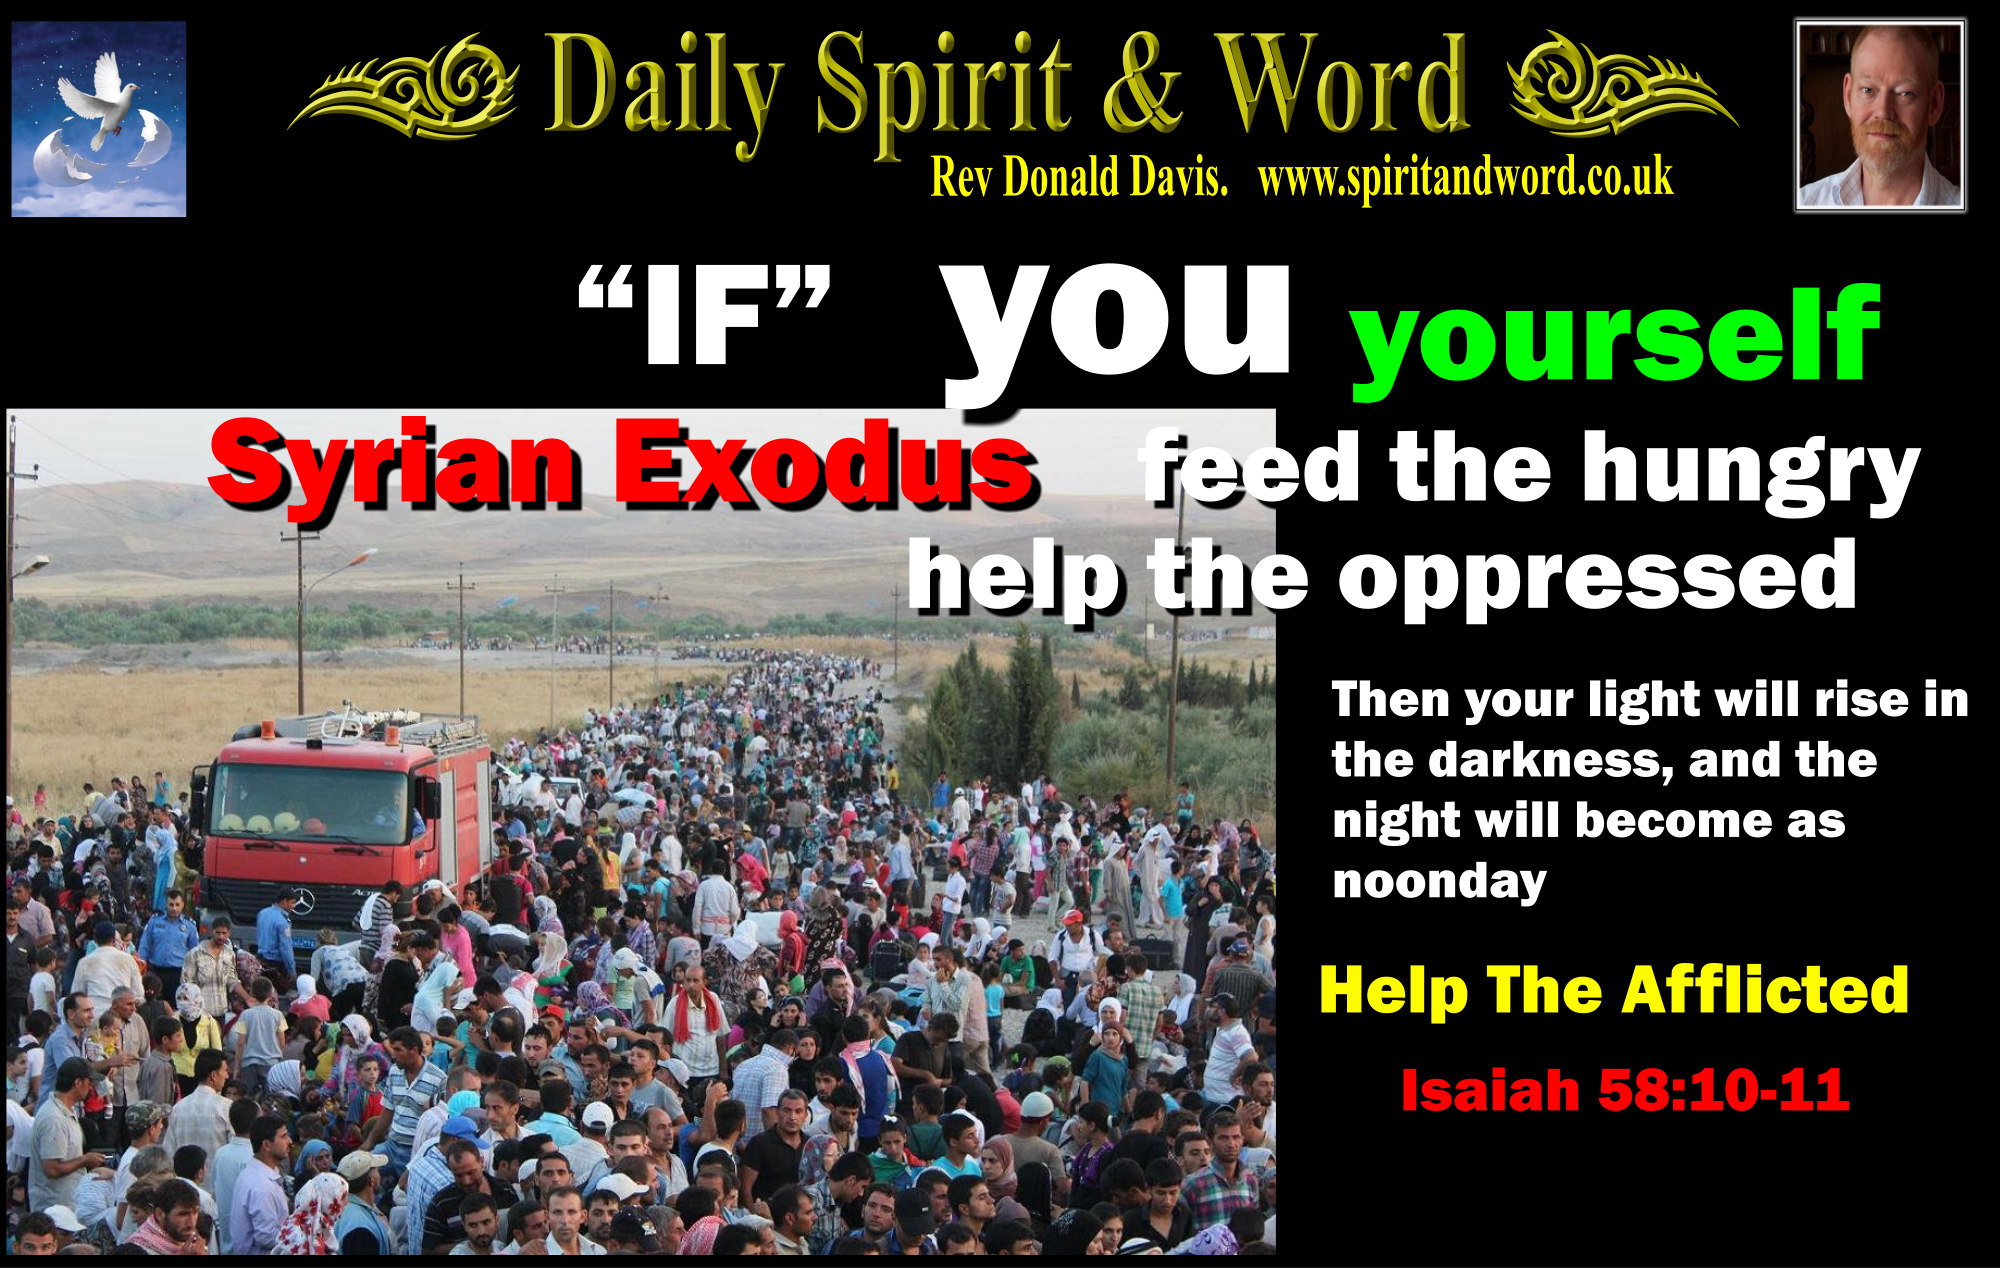 Syrian Exodus Help